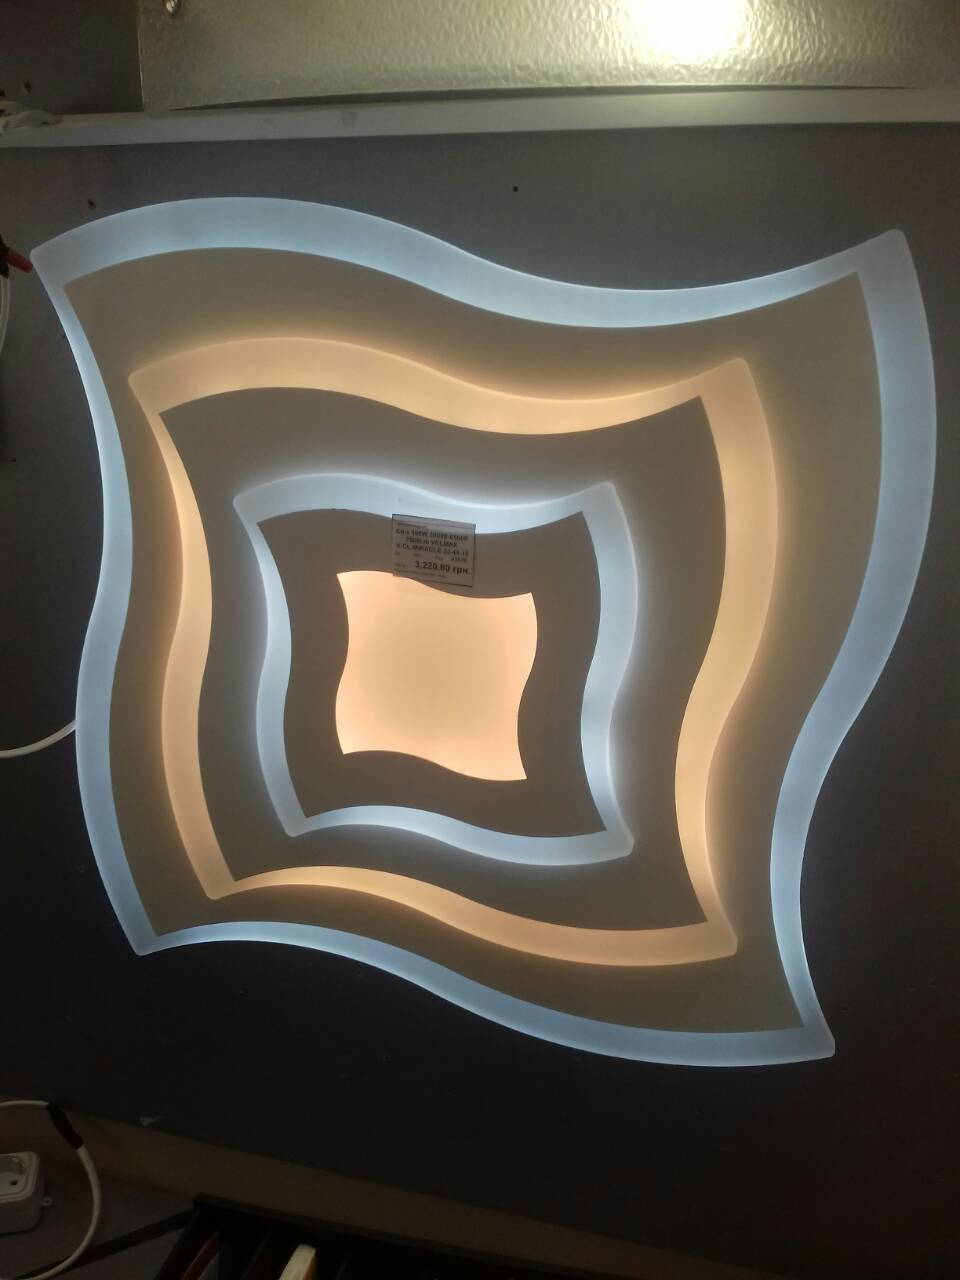 SMART Люстра с пультом MIRACLE 100W 49 см диаметр, LED светильник